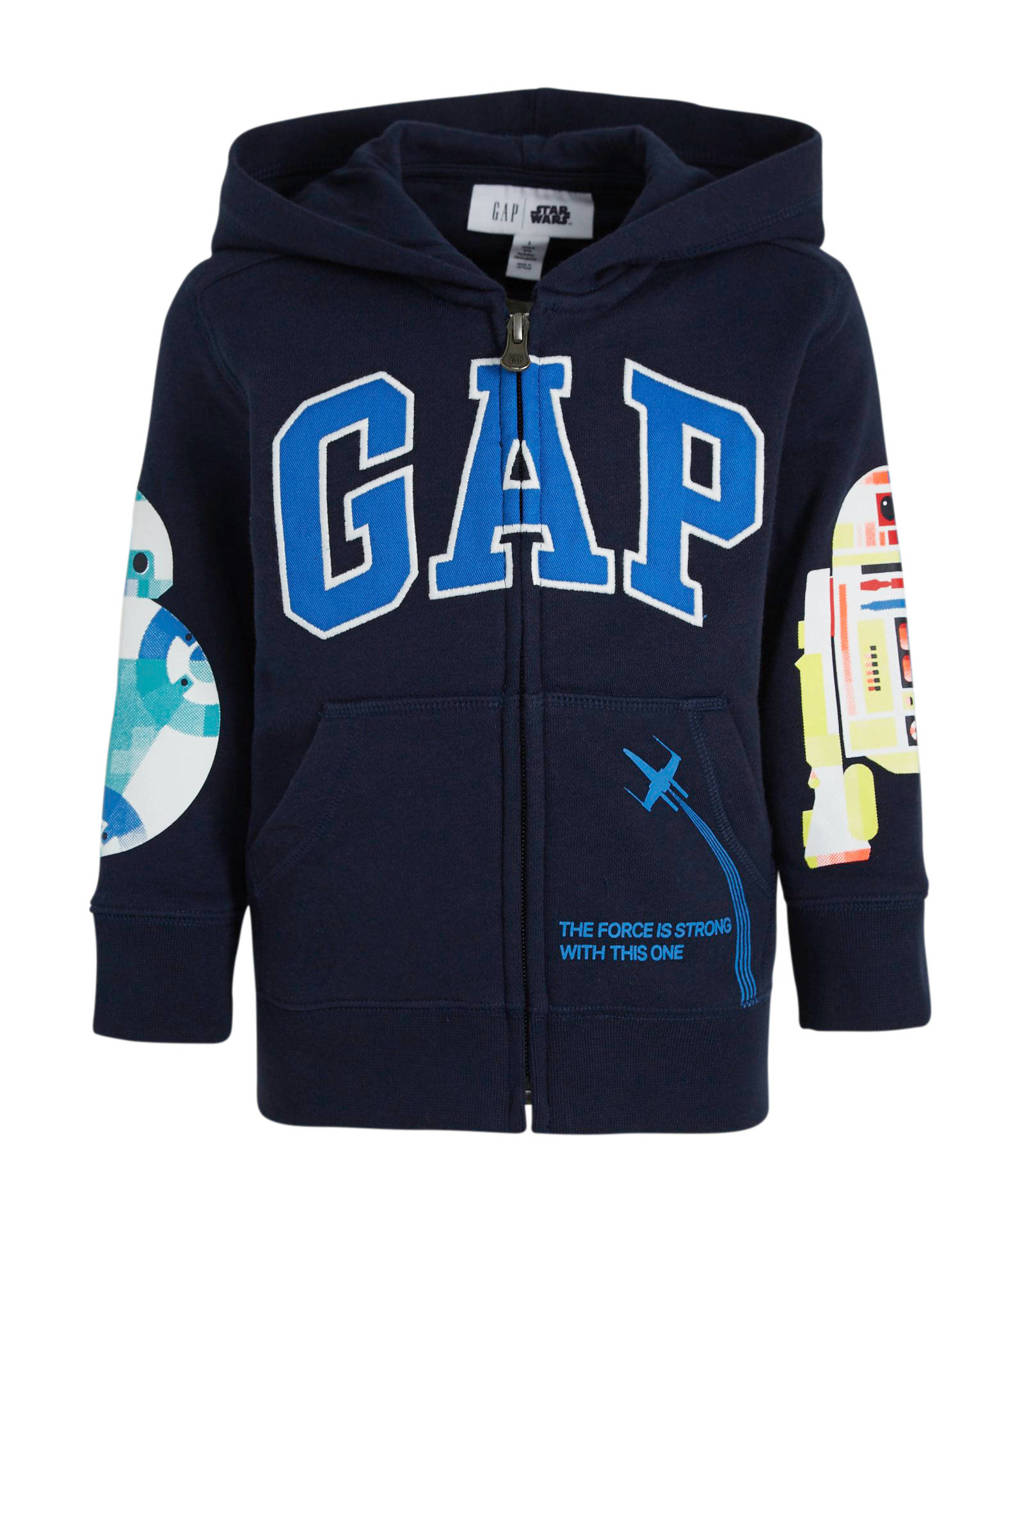 GAP vest met logo en borduursels donkerblauw/blauw/wit, Donkerblauw/blauw/wit